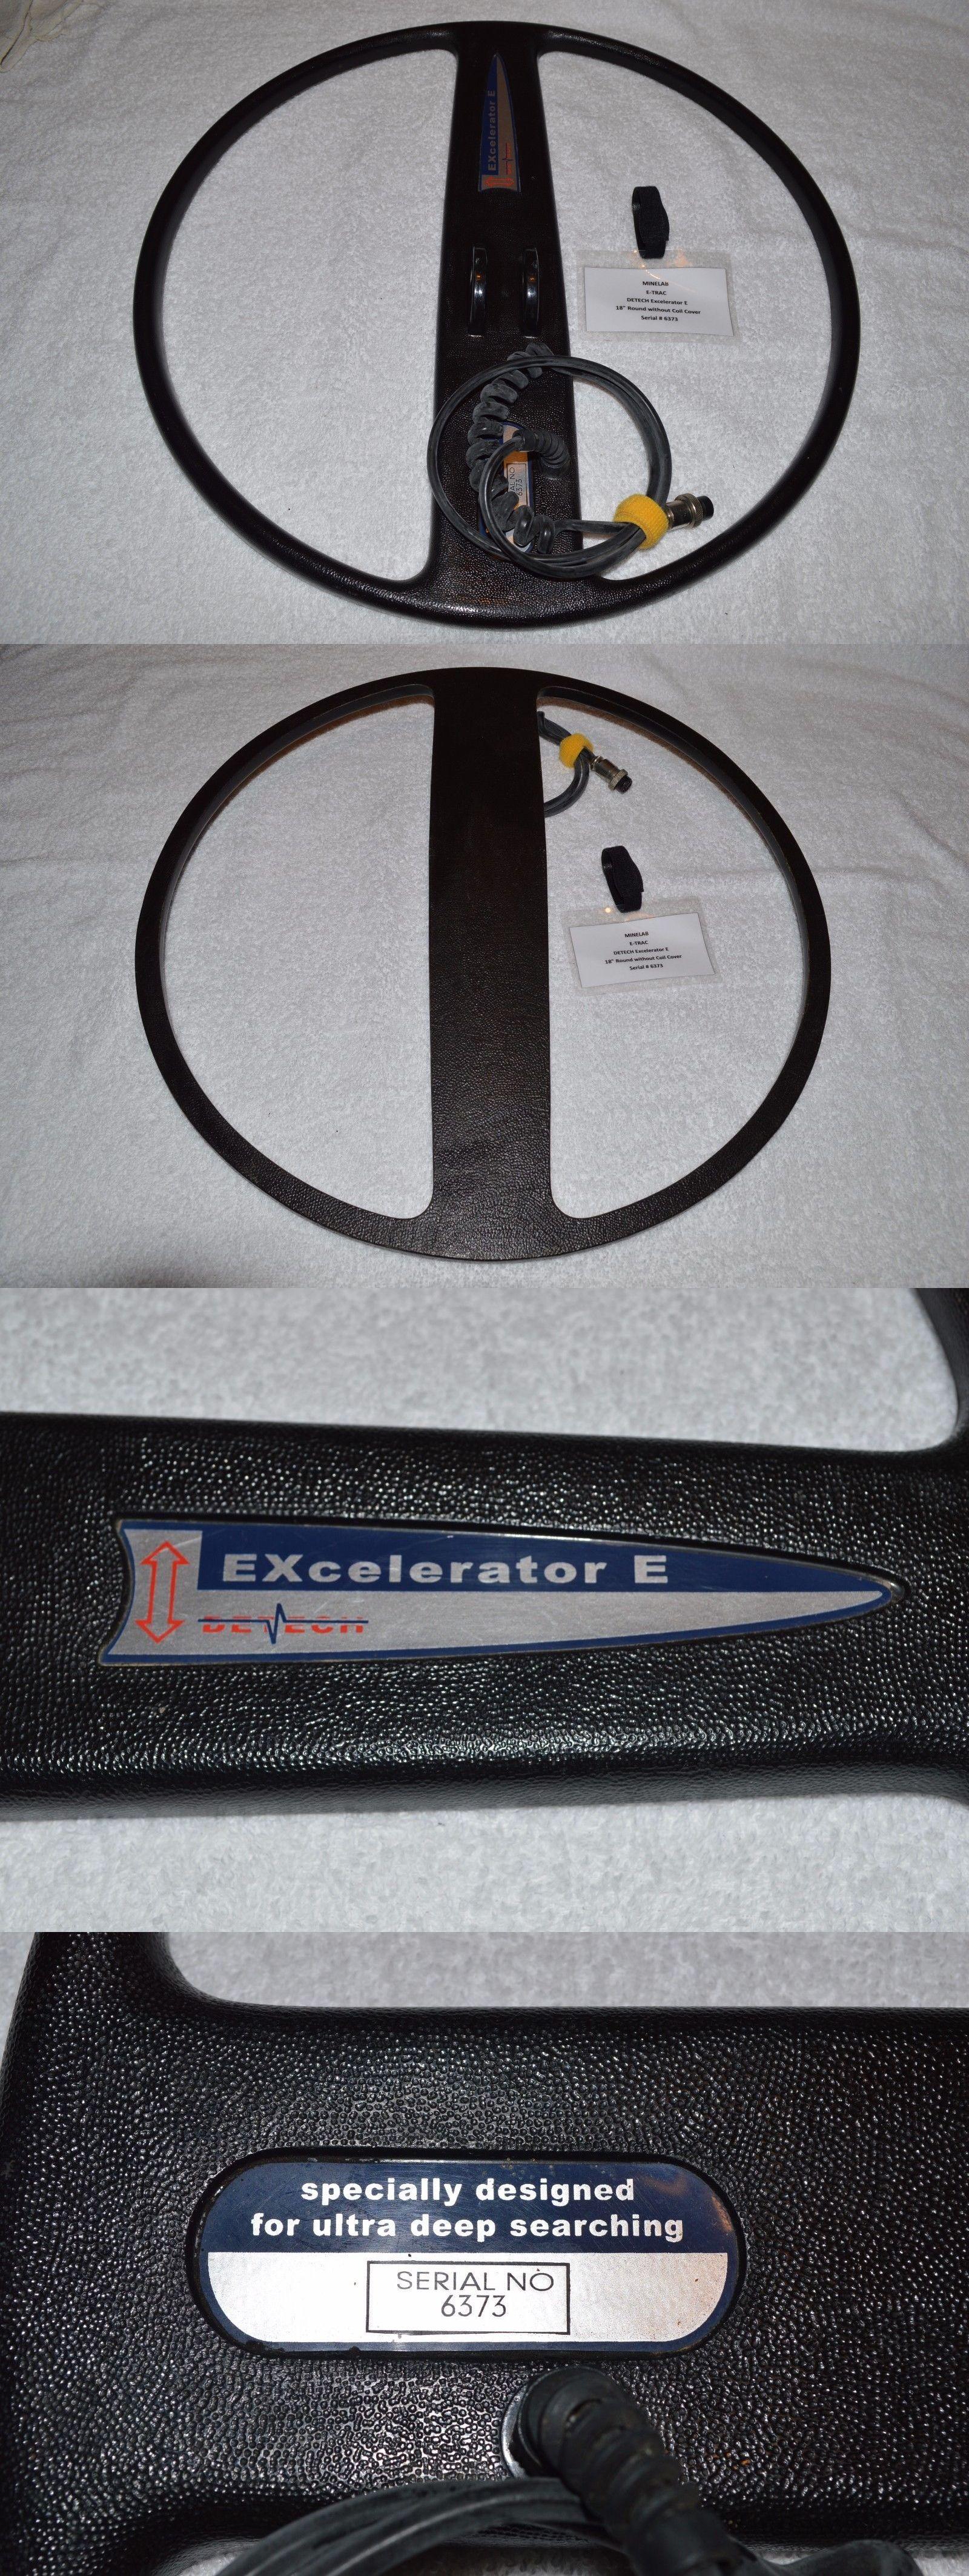 Metal Detector Accessories Detech 18 Excelerator E Dd Coil